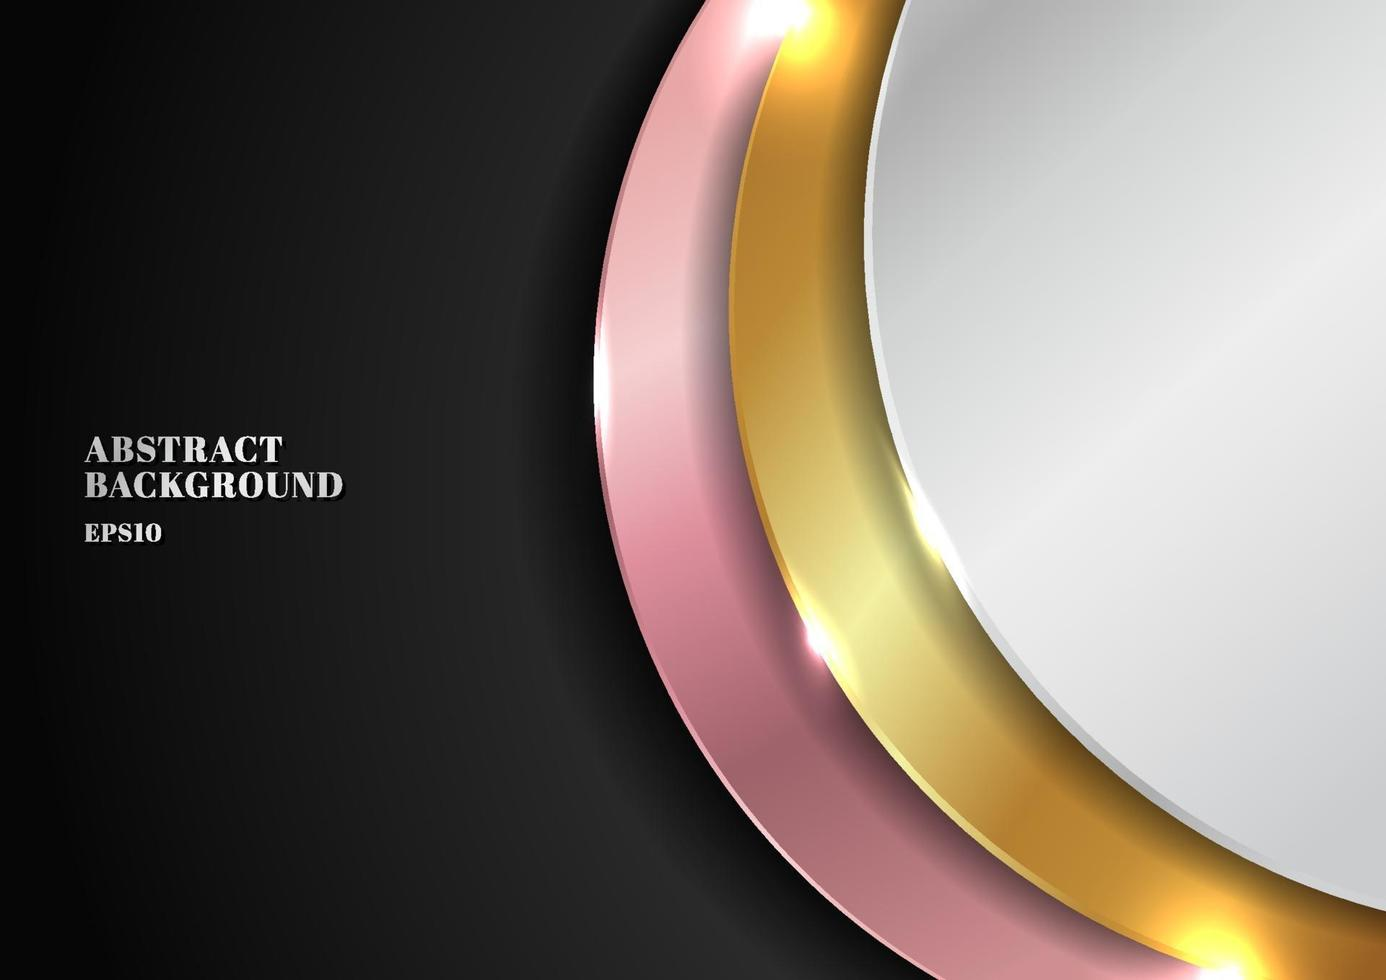 abstraktes modernes goldenes, silbernes, roségoldes Kreisdesign vektor